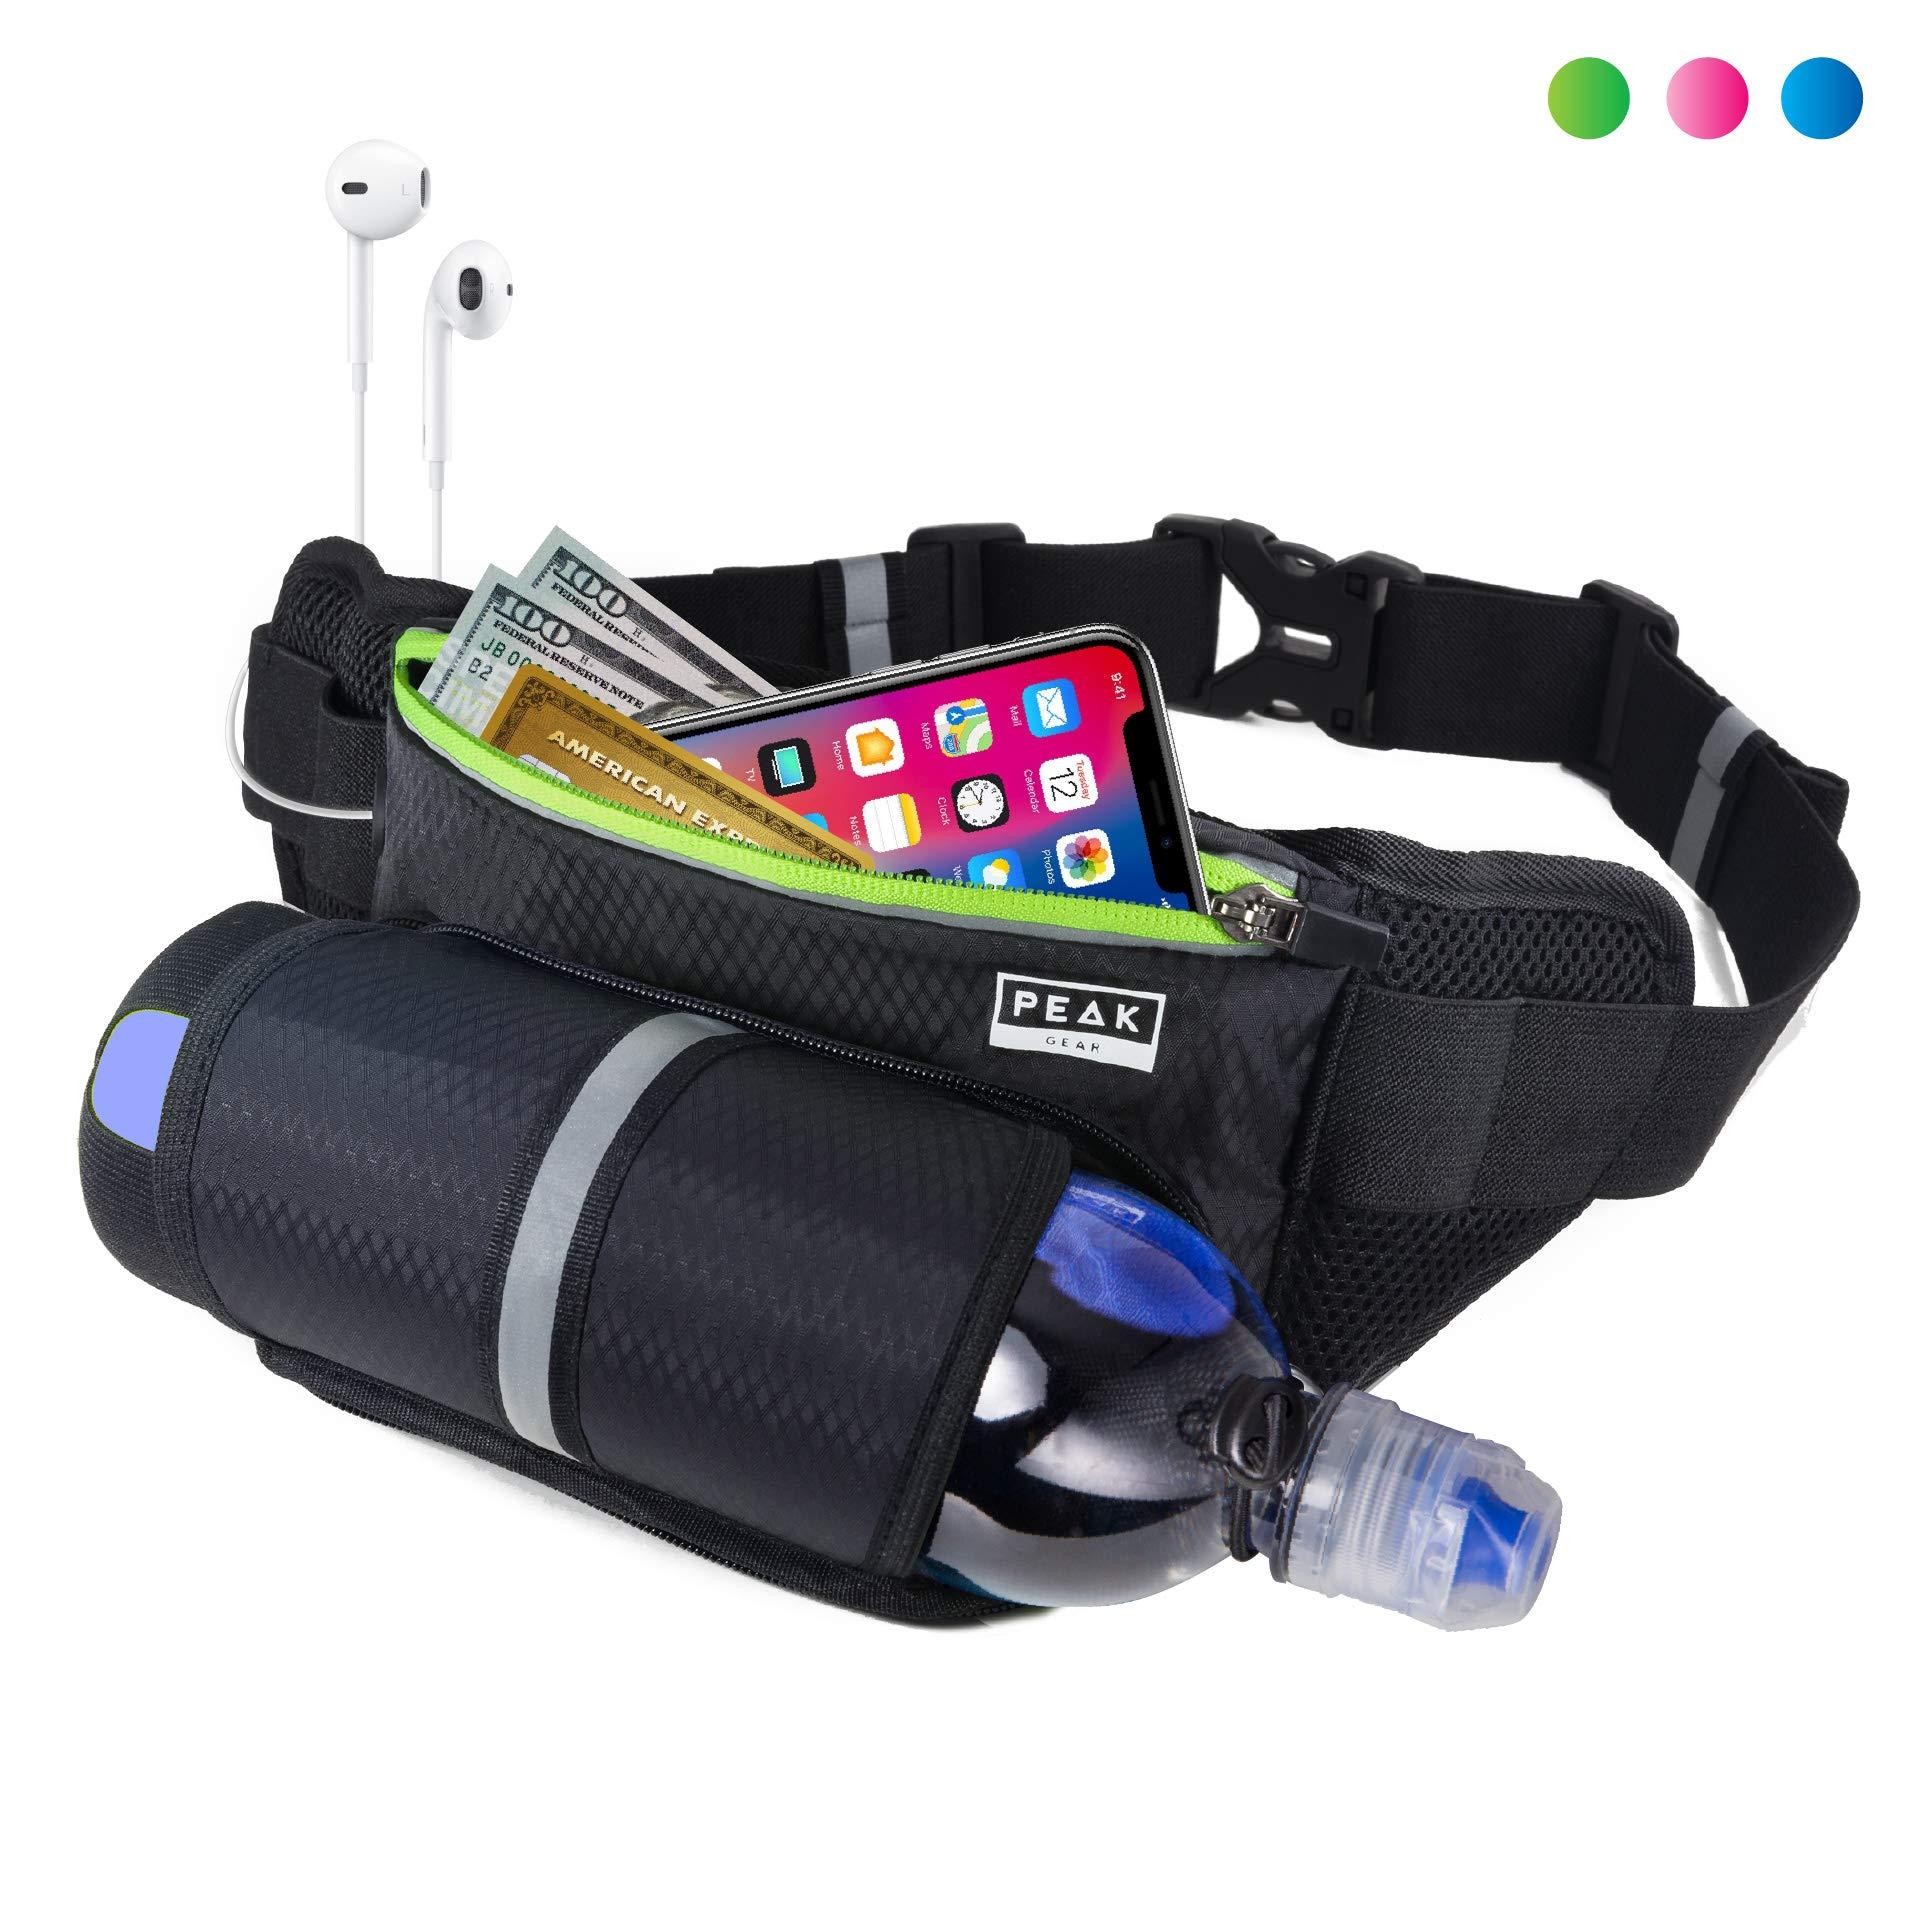 Peak Gear Waist Pack and Water Bottle Belt - New Larger Size - Hydration Fanny Pack for Jogging, Walking or Hiking (Green Zipper) by Peak Gear